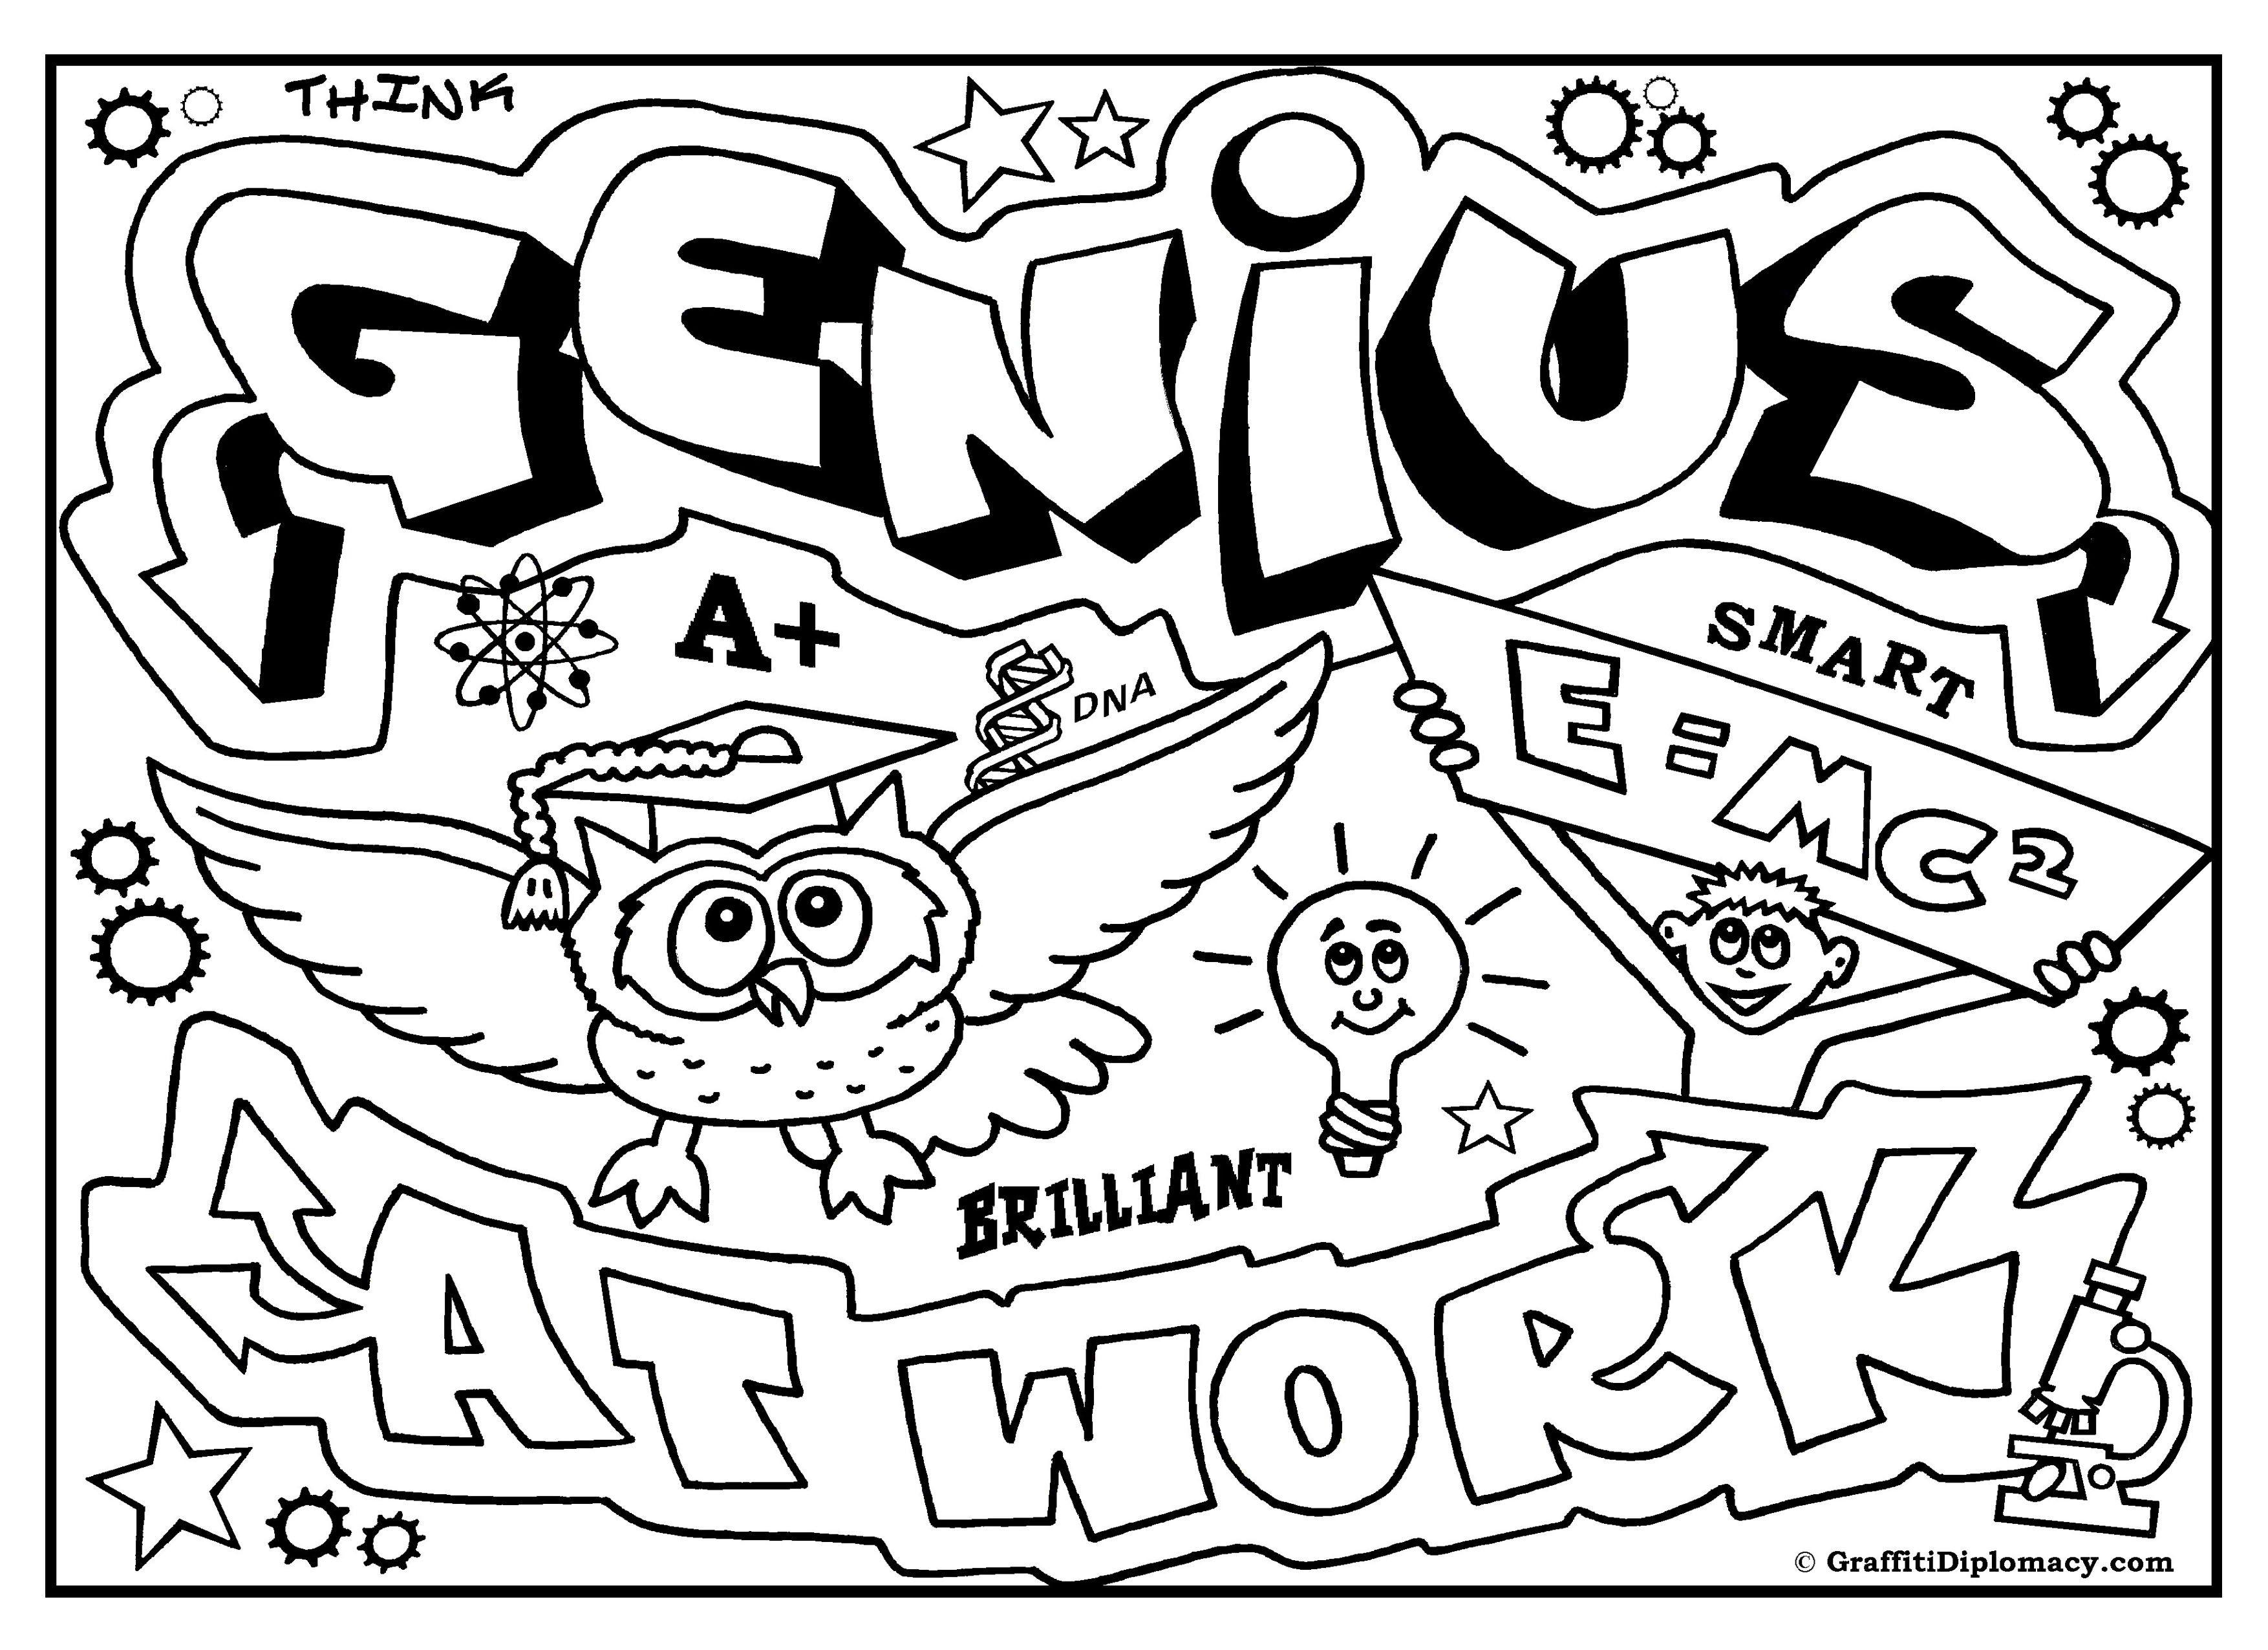 Genius At Work Free Coloring Page Graffiti Diplomacy Coloring Books Graffiti Graffiti Words